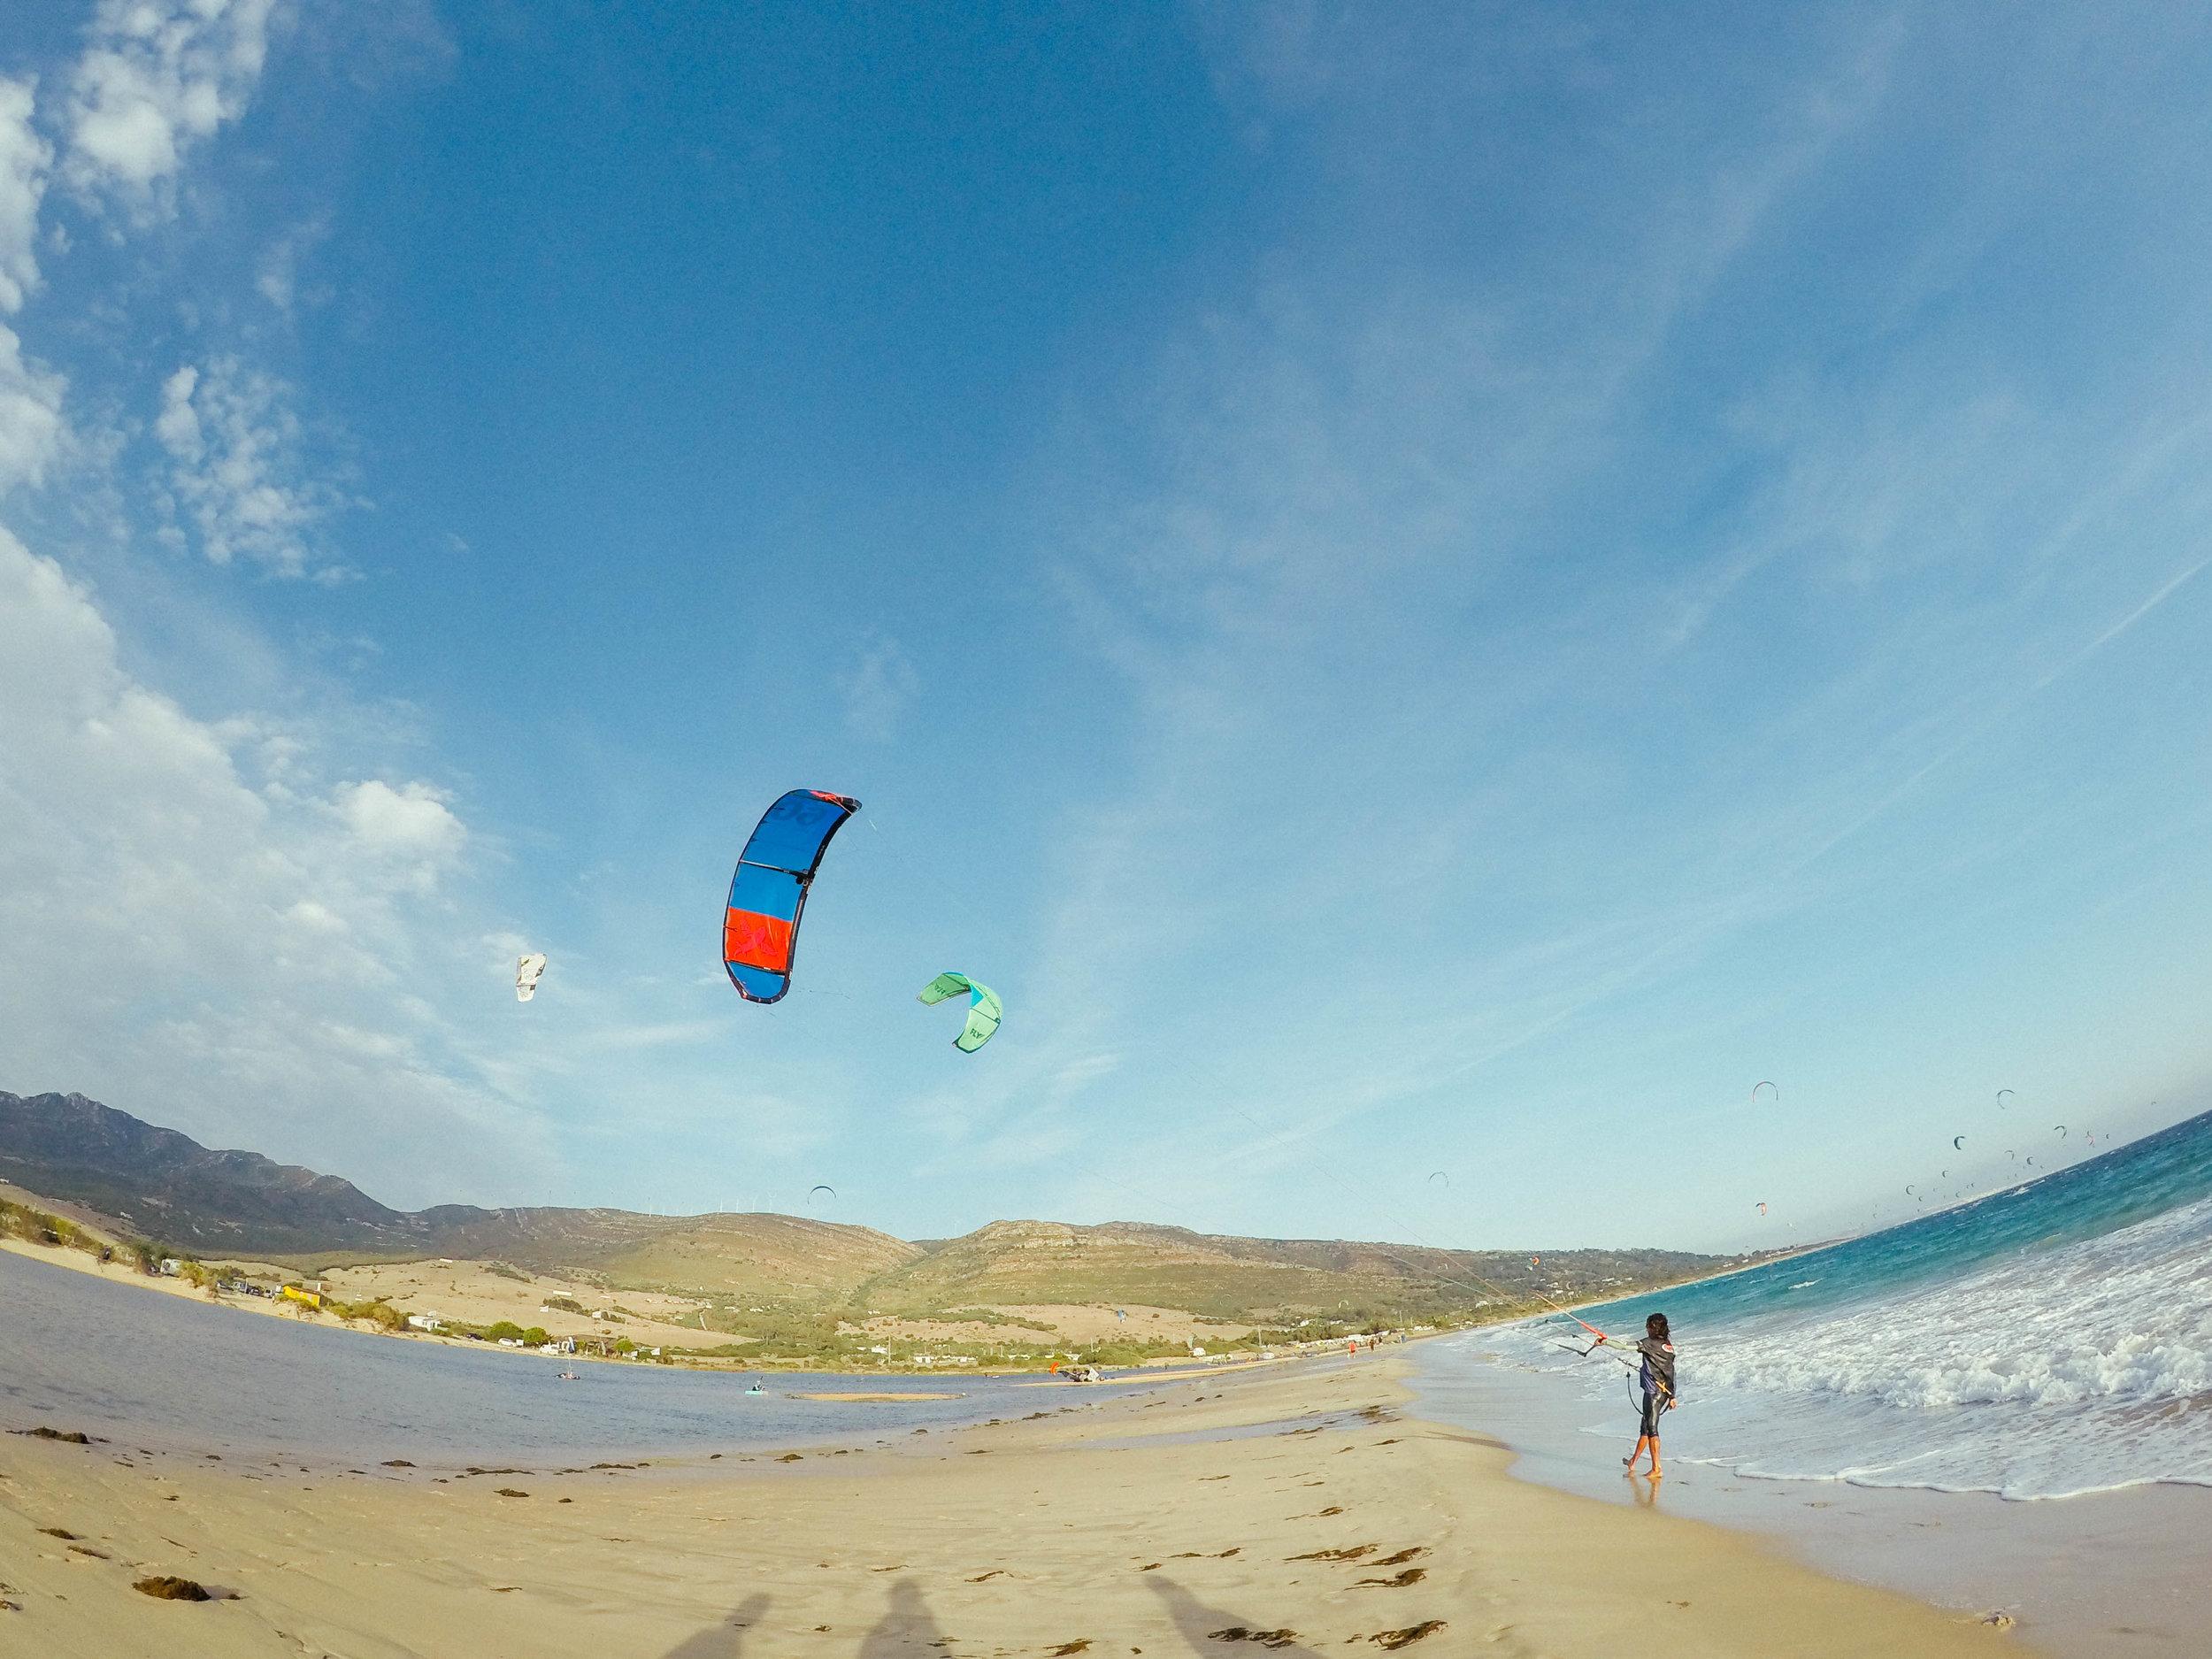 Kitesurfing Tarifa, Spain.